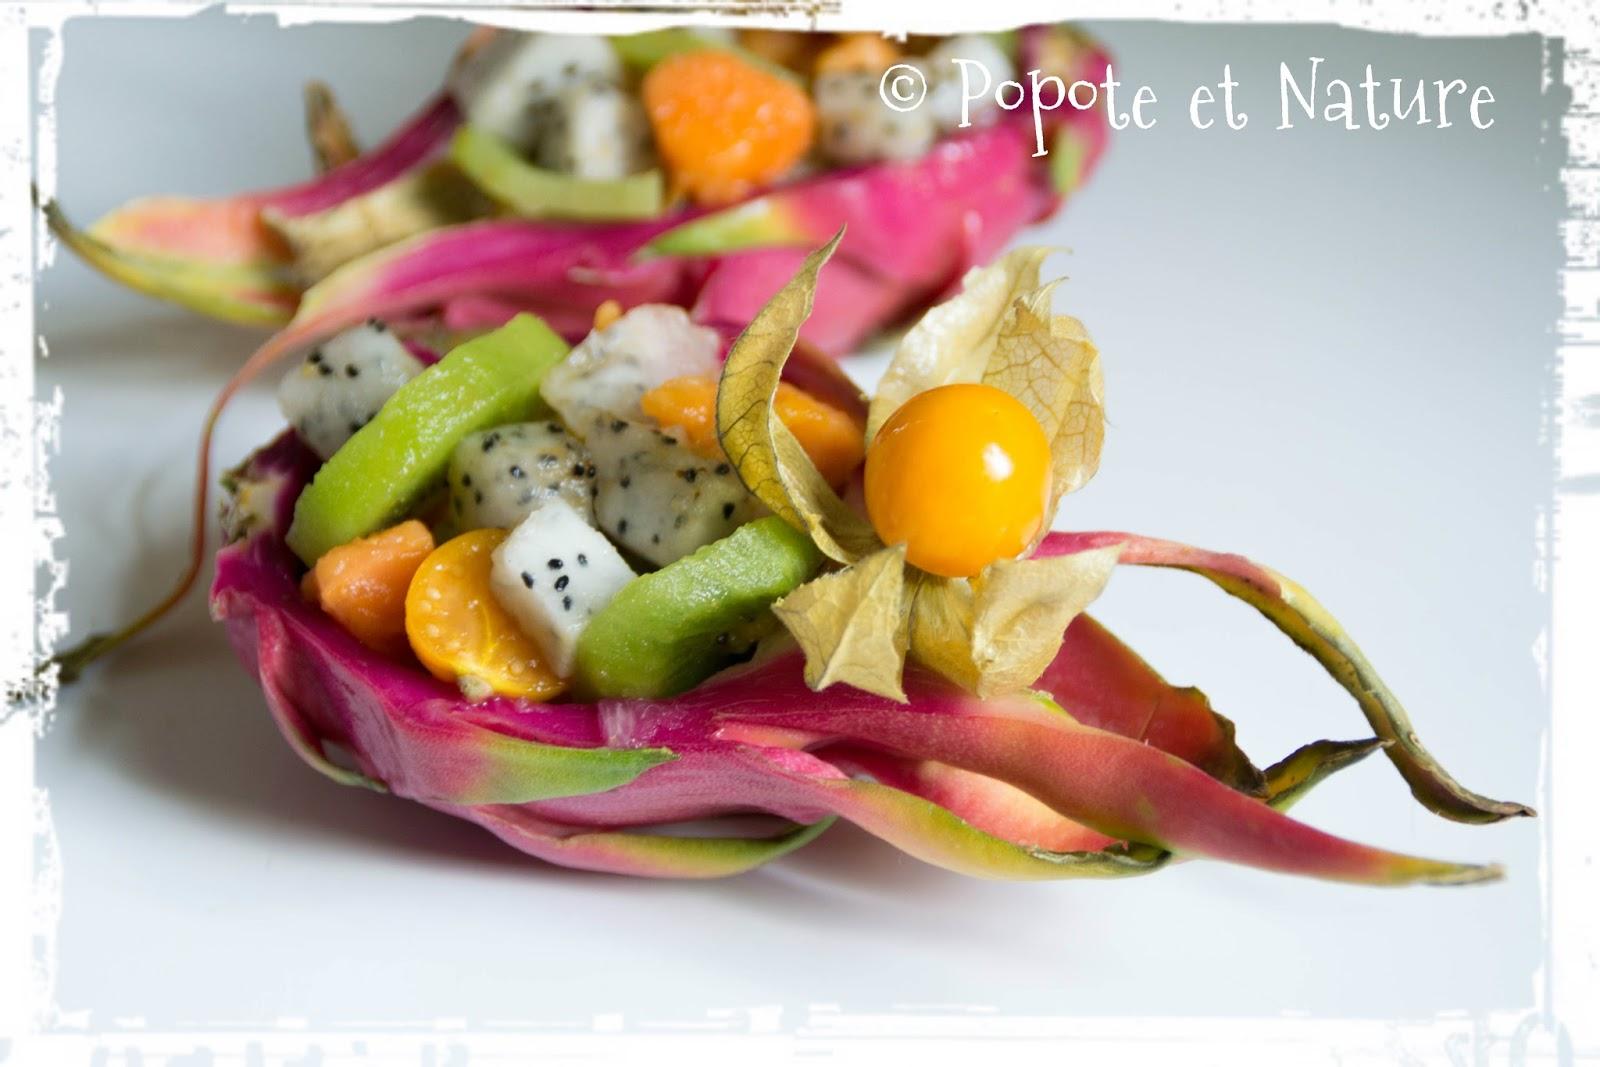 popote et nature salade de fruits exotiques au fruit du dragon. Black Bedroom Furniture Sets. Home Design Ideas